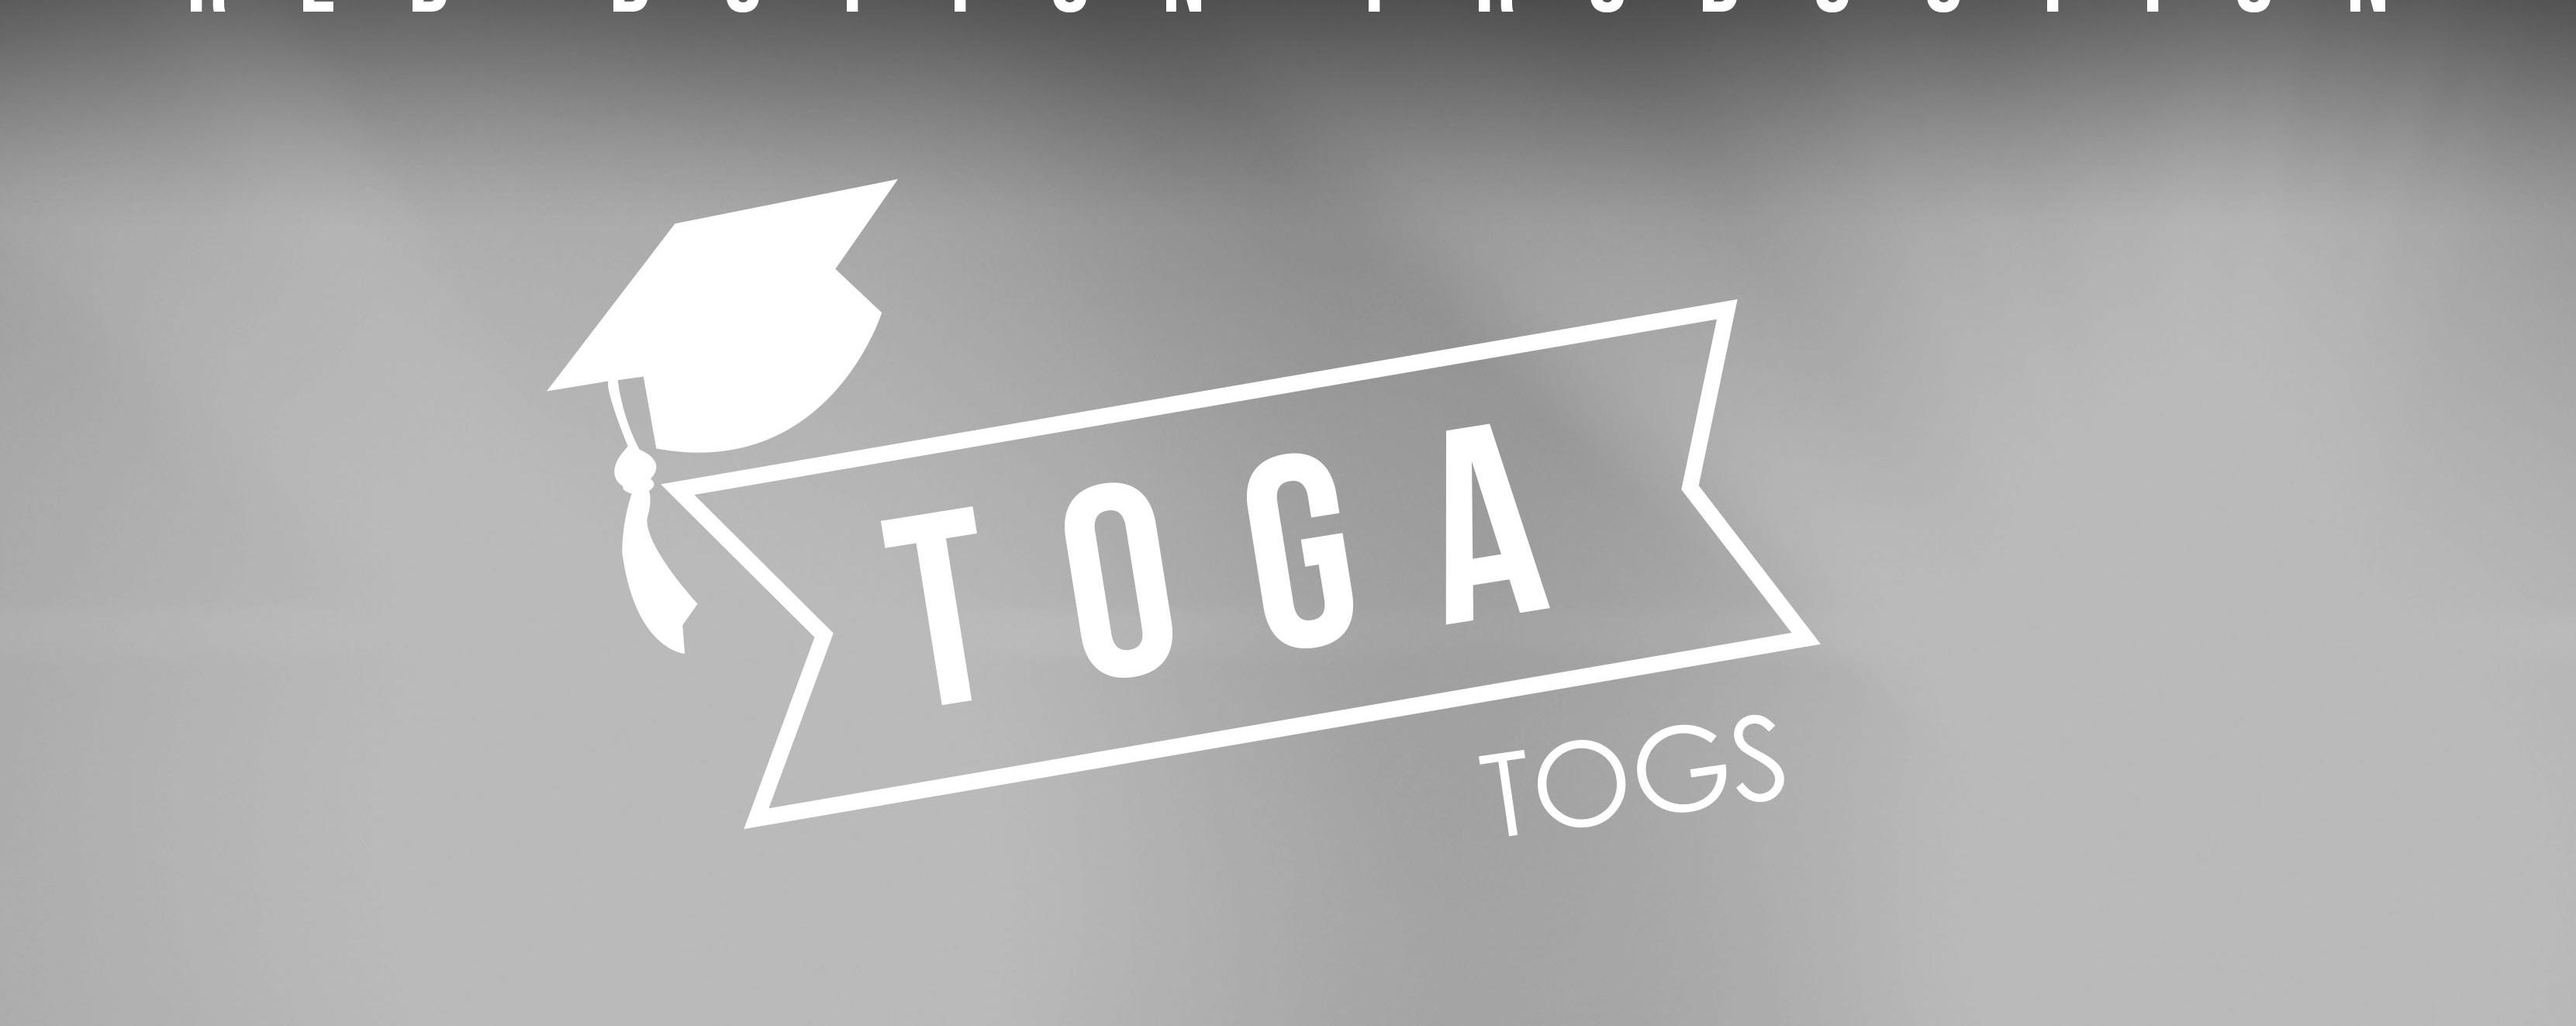 TOGA-Togs